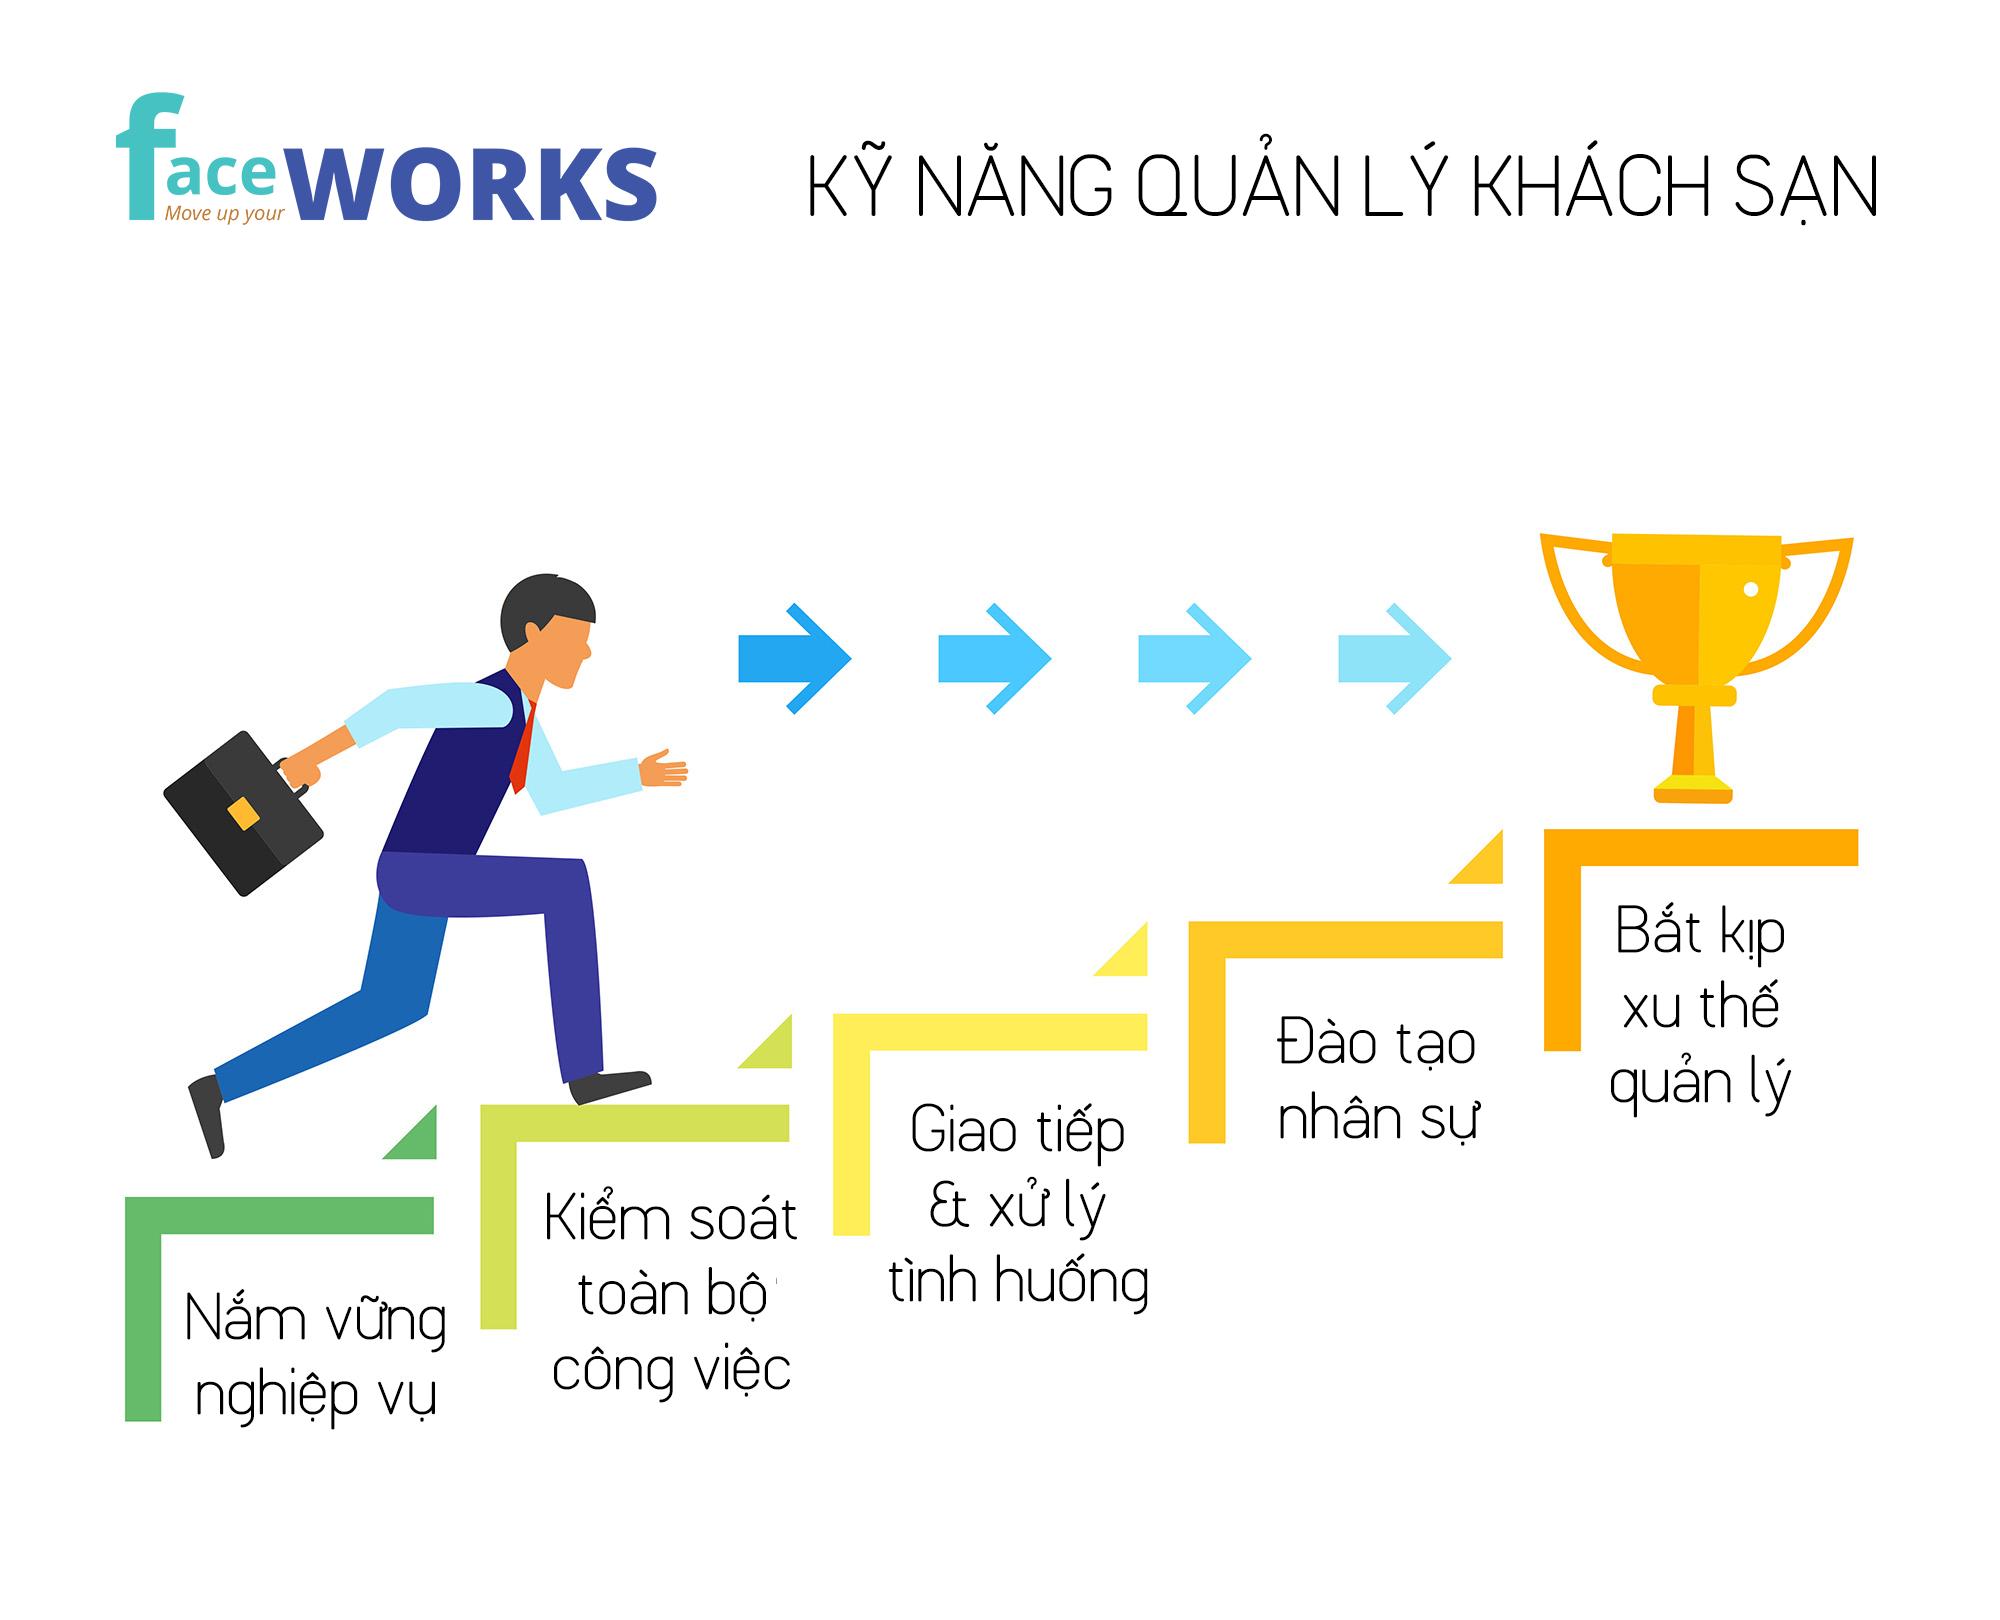 ky-nang-quan-ly-khach-san